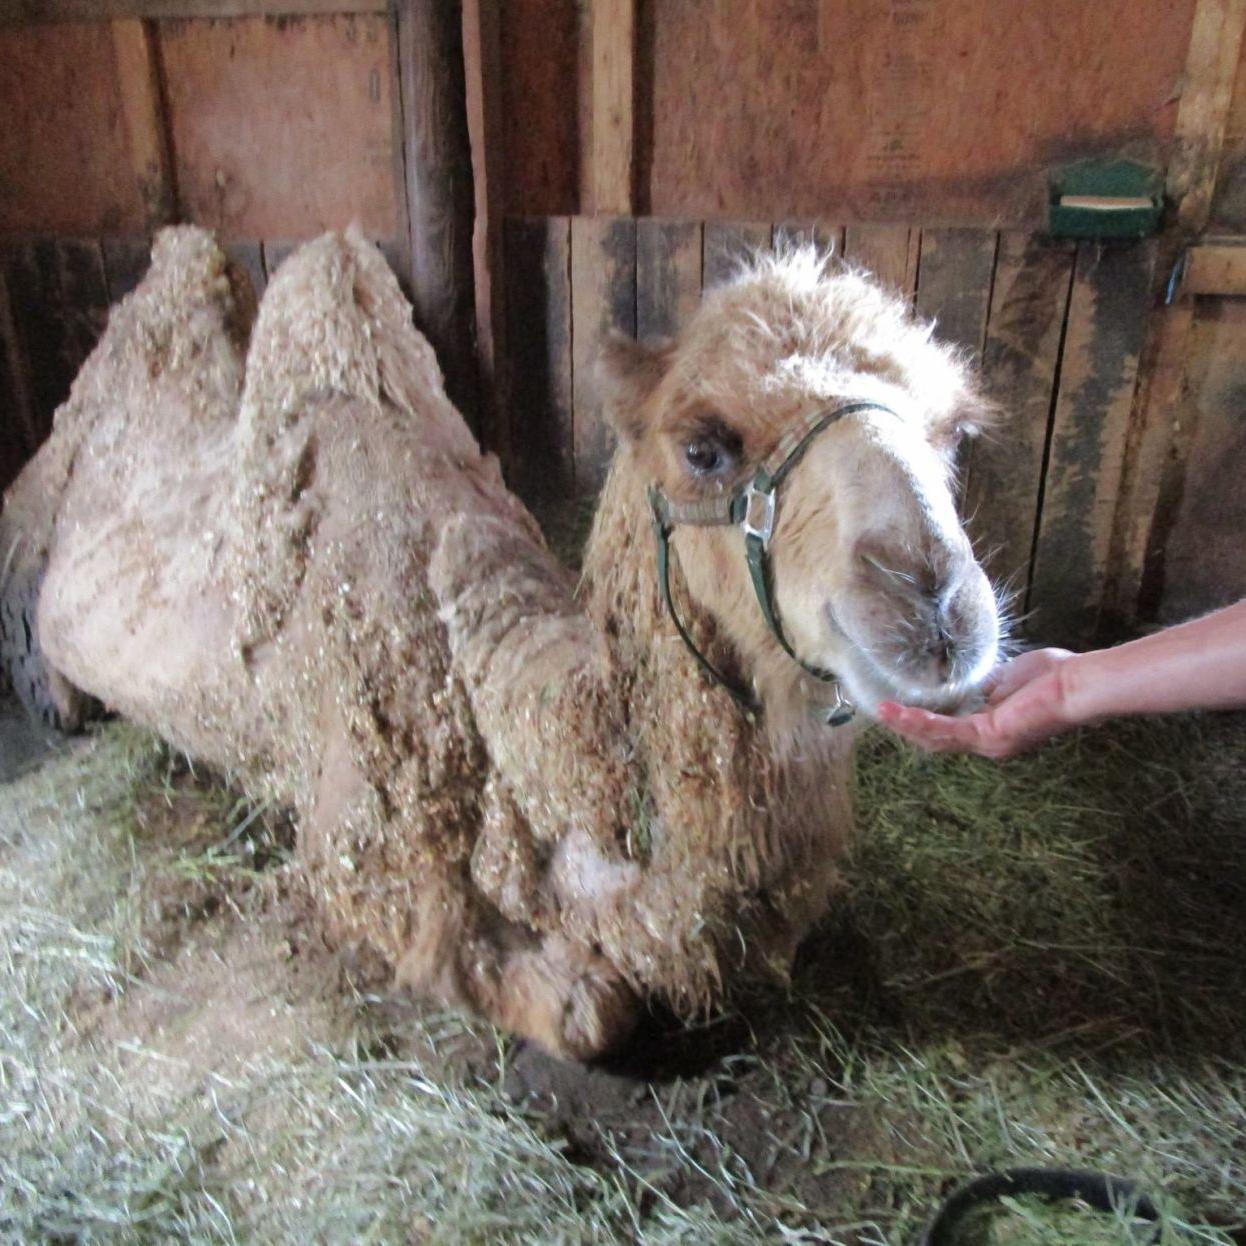 Culpeper animal rescue team aids stranded camel | Virginia